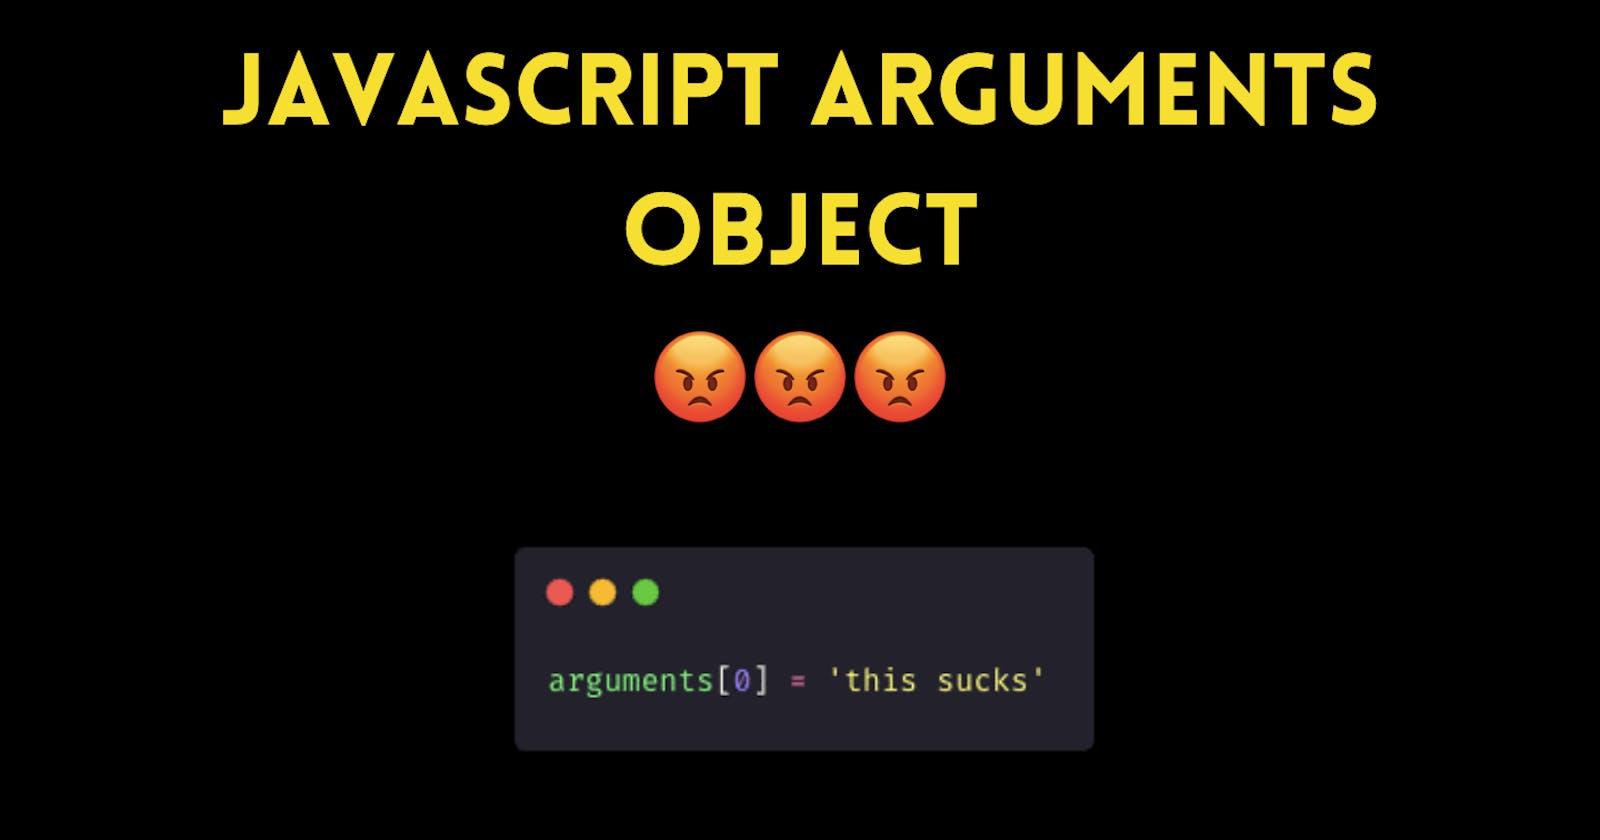 JavaScript's freaking arguments object 😡